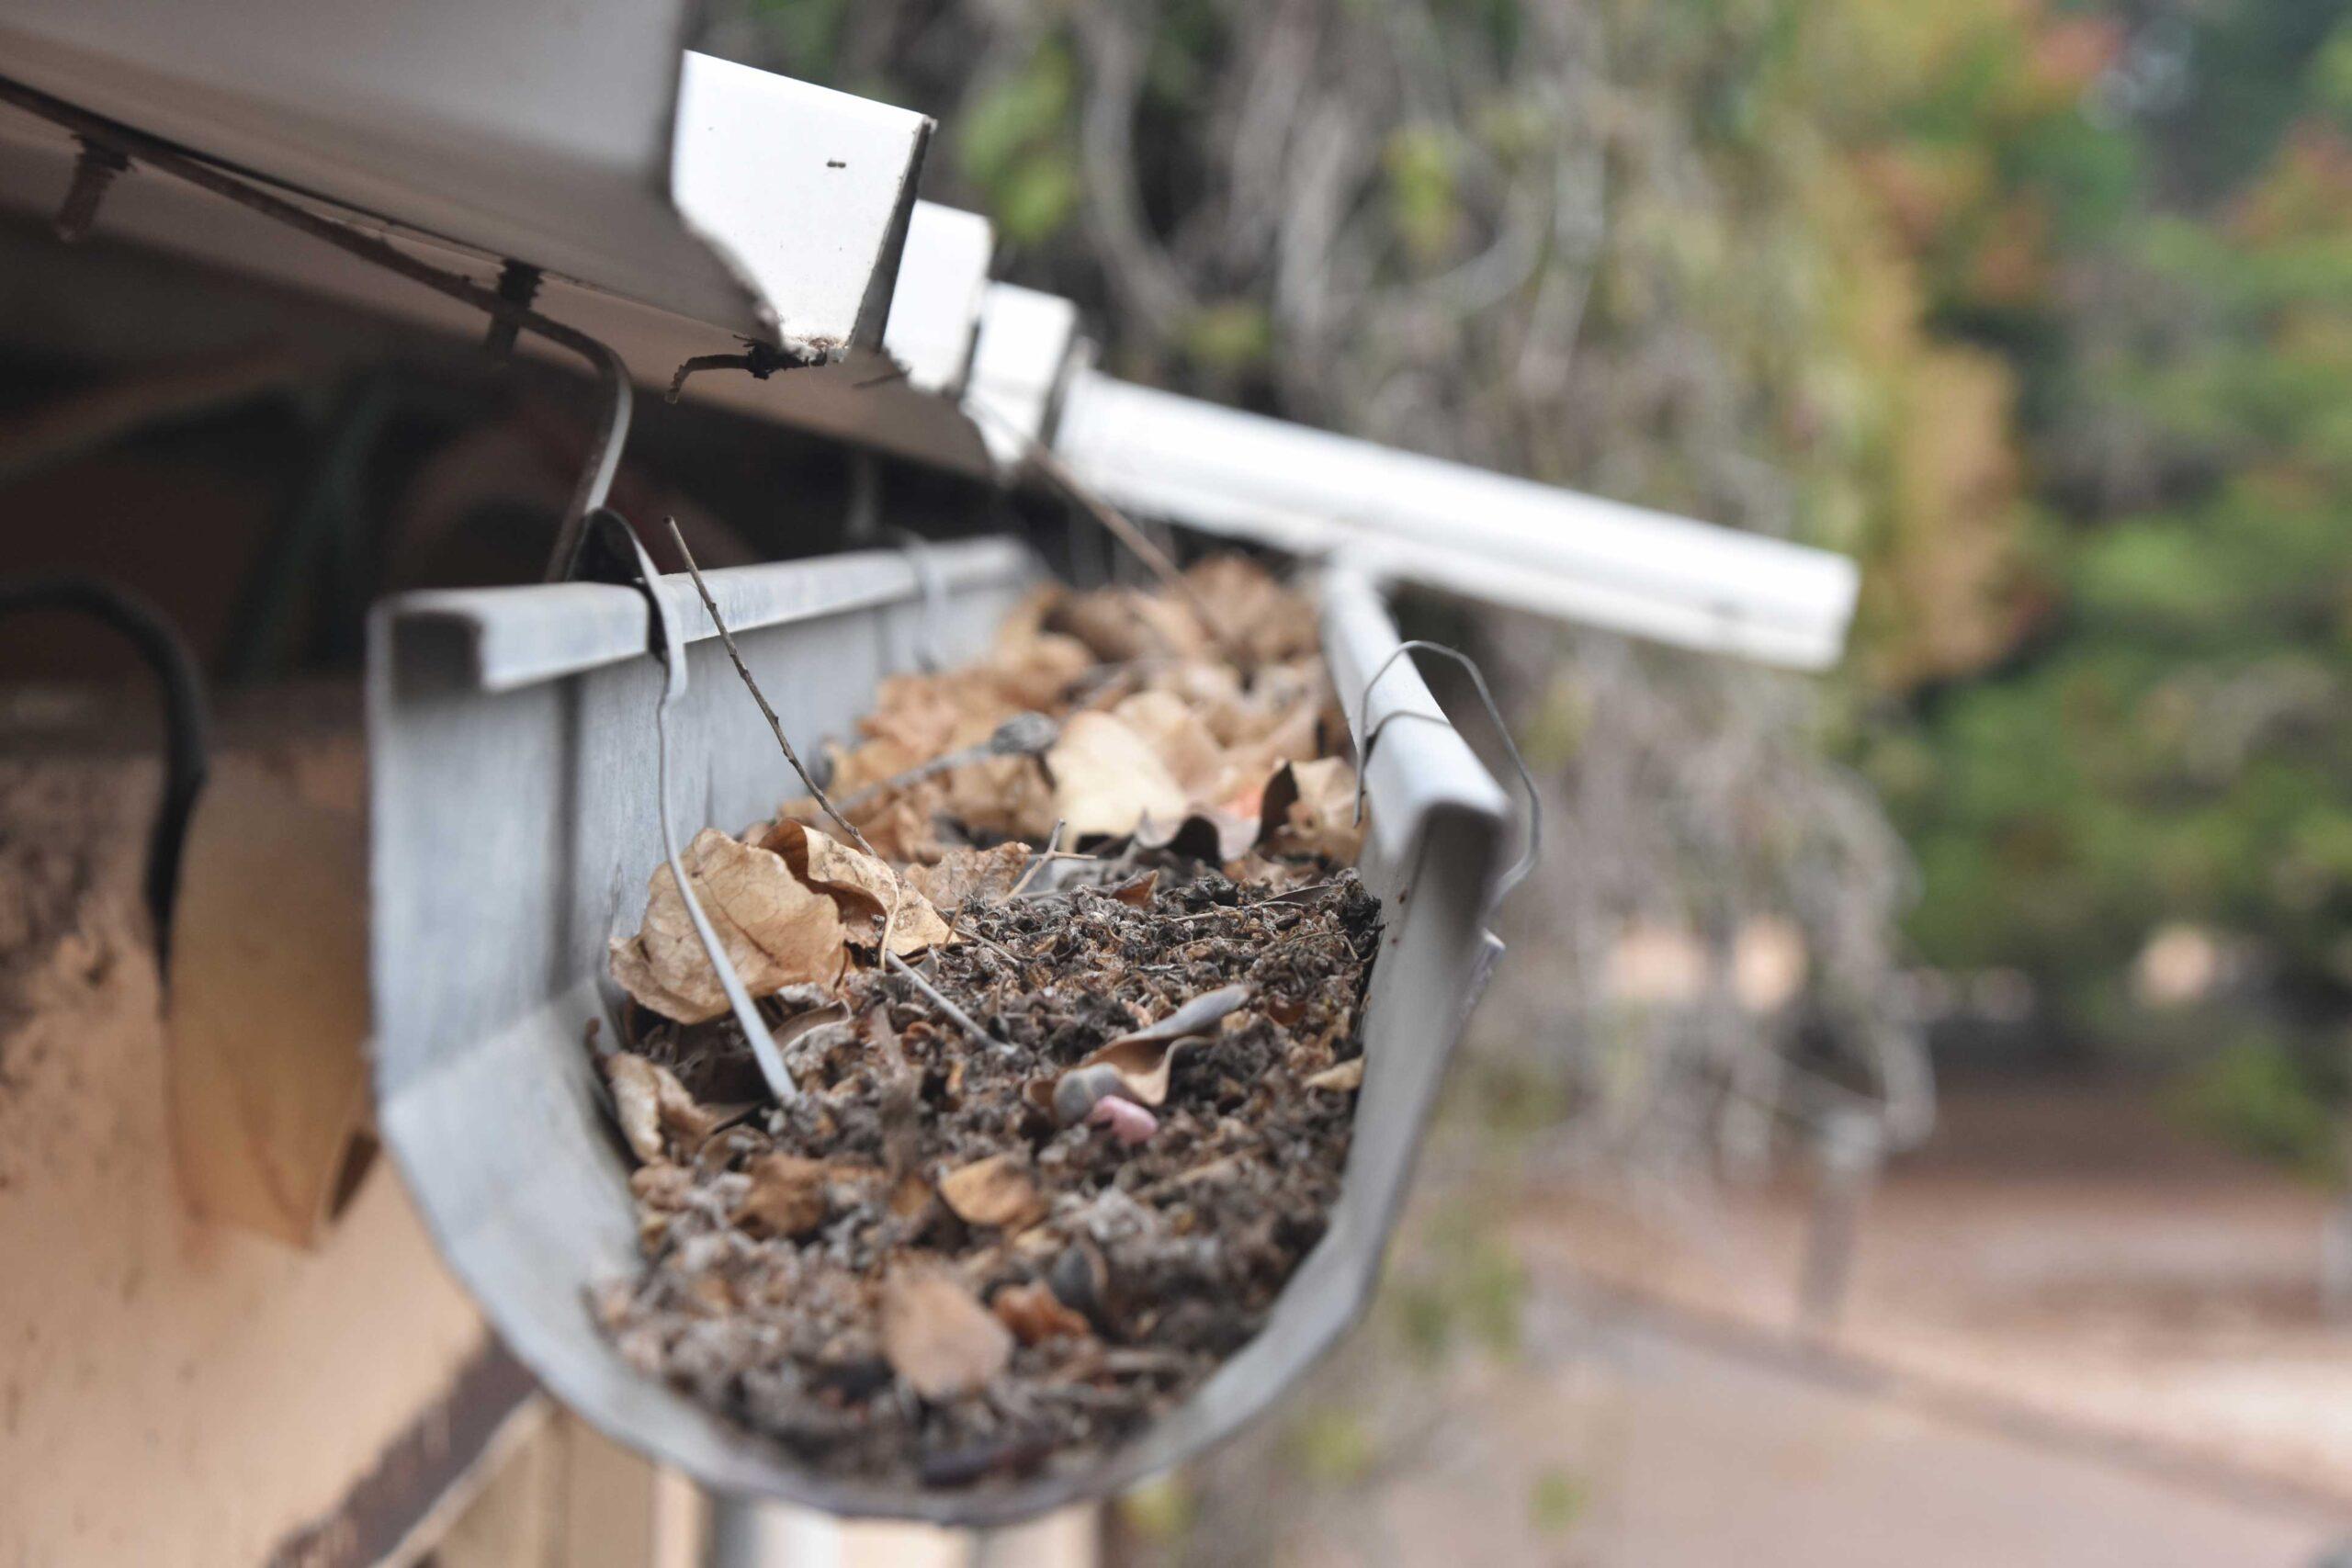 Dedicated Roofing & Exteriors - Professional Roofing Calgary Roof Repair Roof Replacement Eavestrough Damage Repair